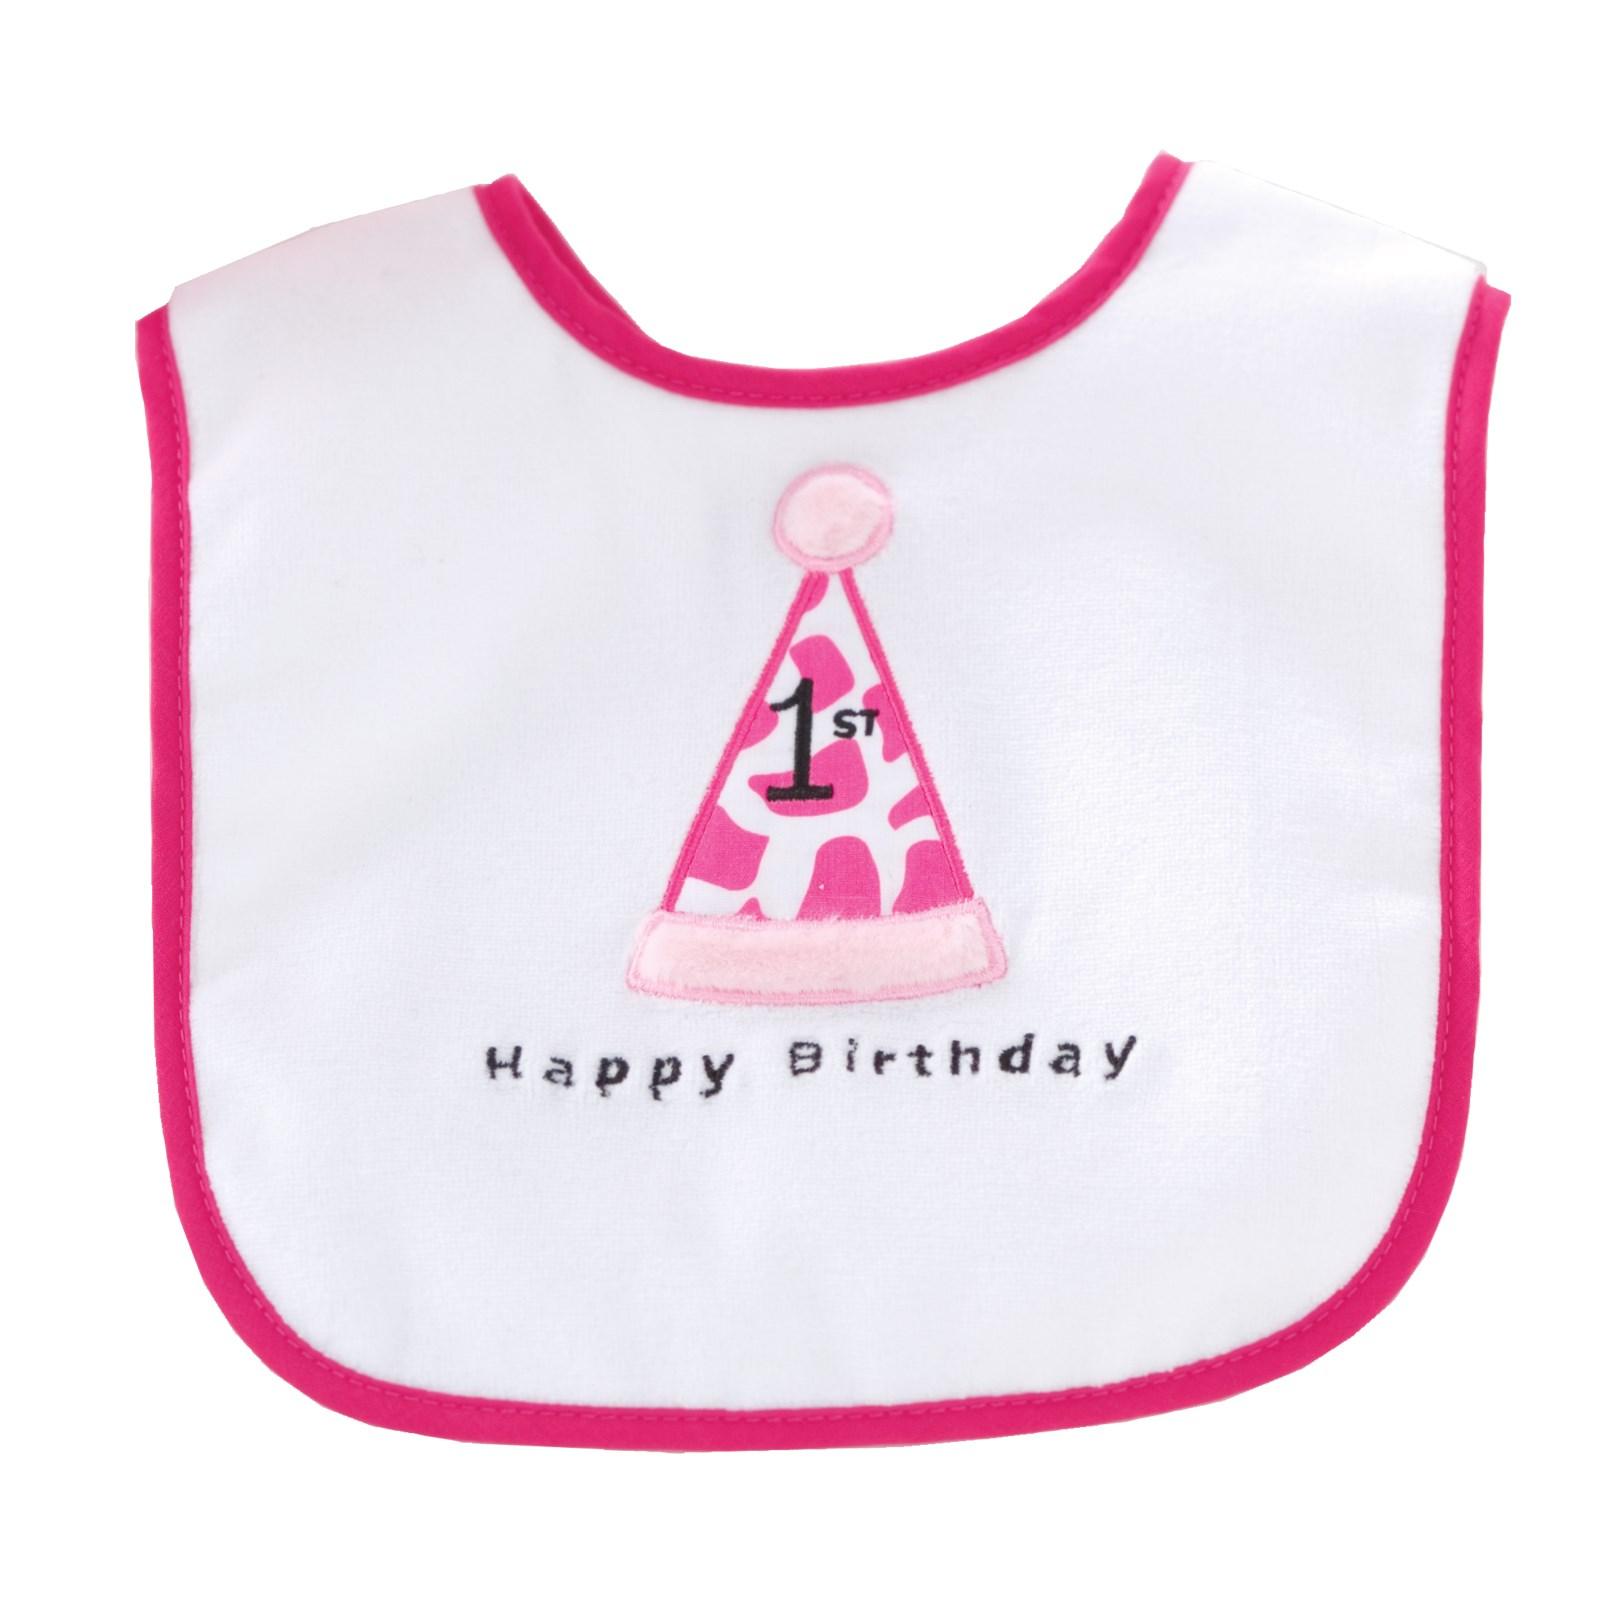 Image of 1st Birthday Diva Cone Hat Bib